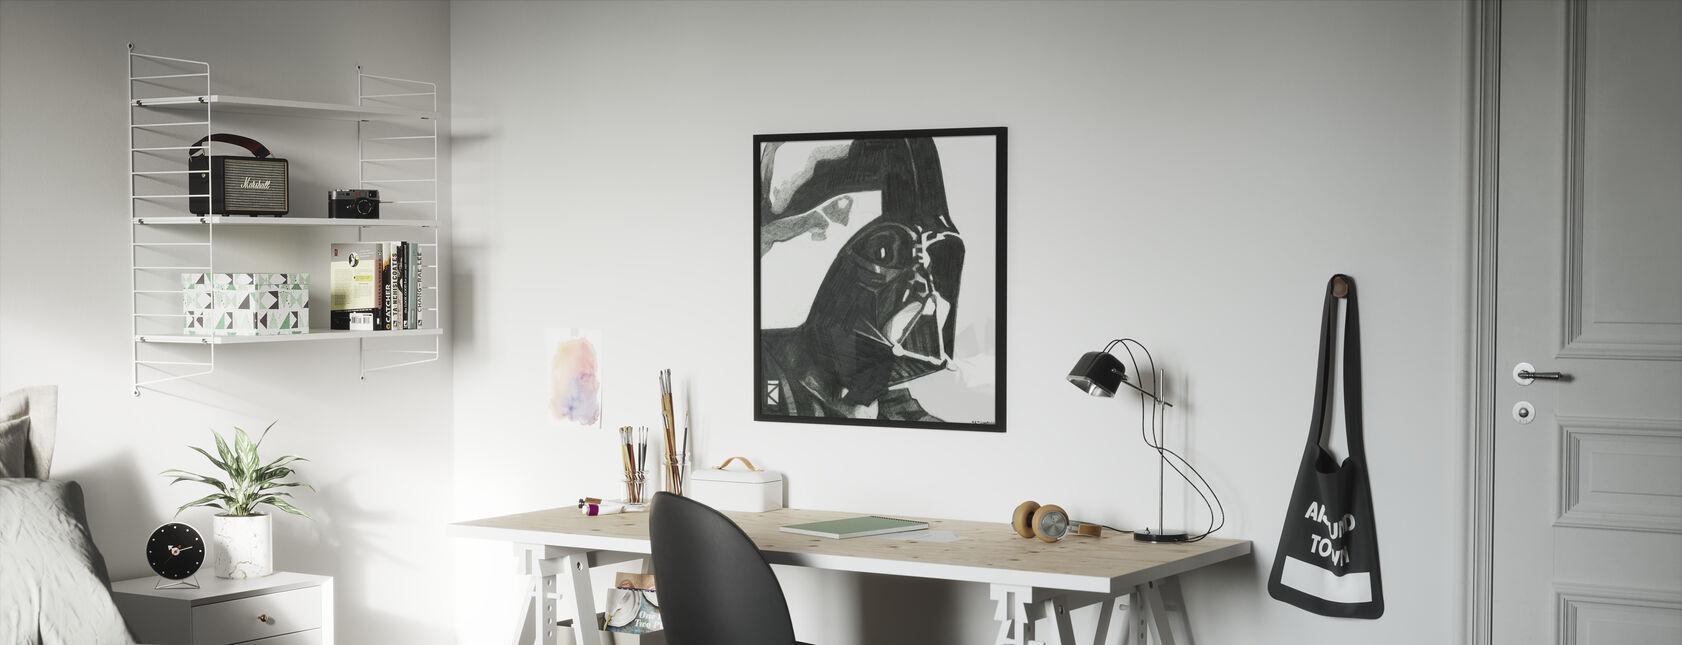 Tähtien sota - Darth Vader 1 - Kehystetty kuva - Lastenhuone